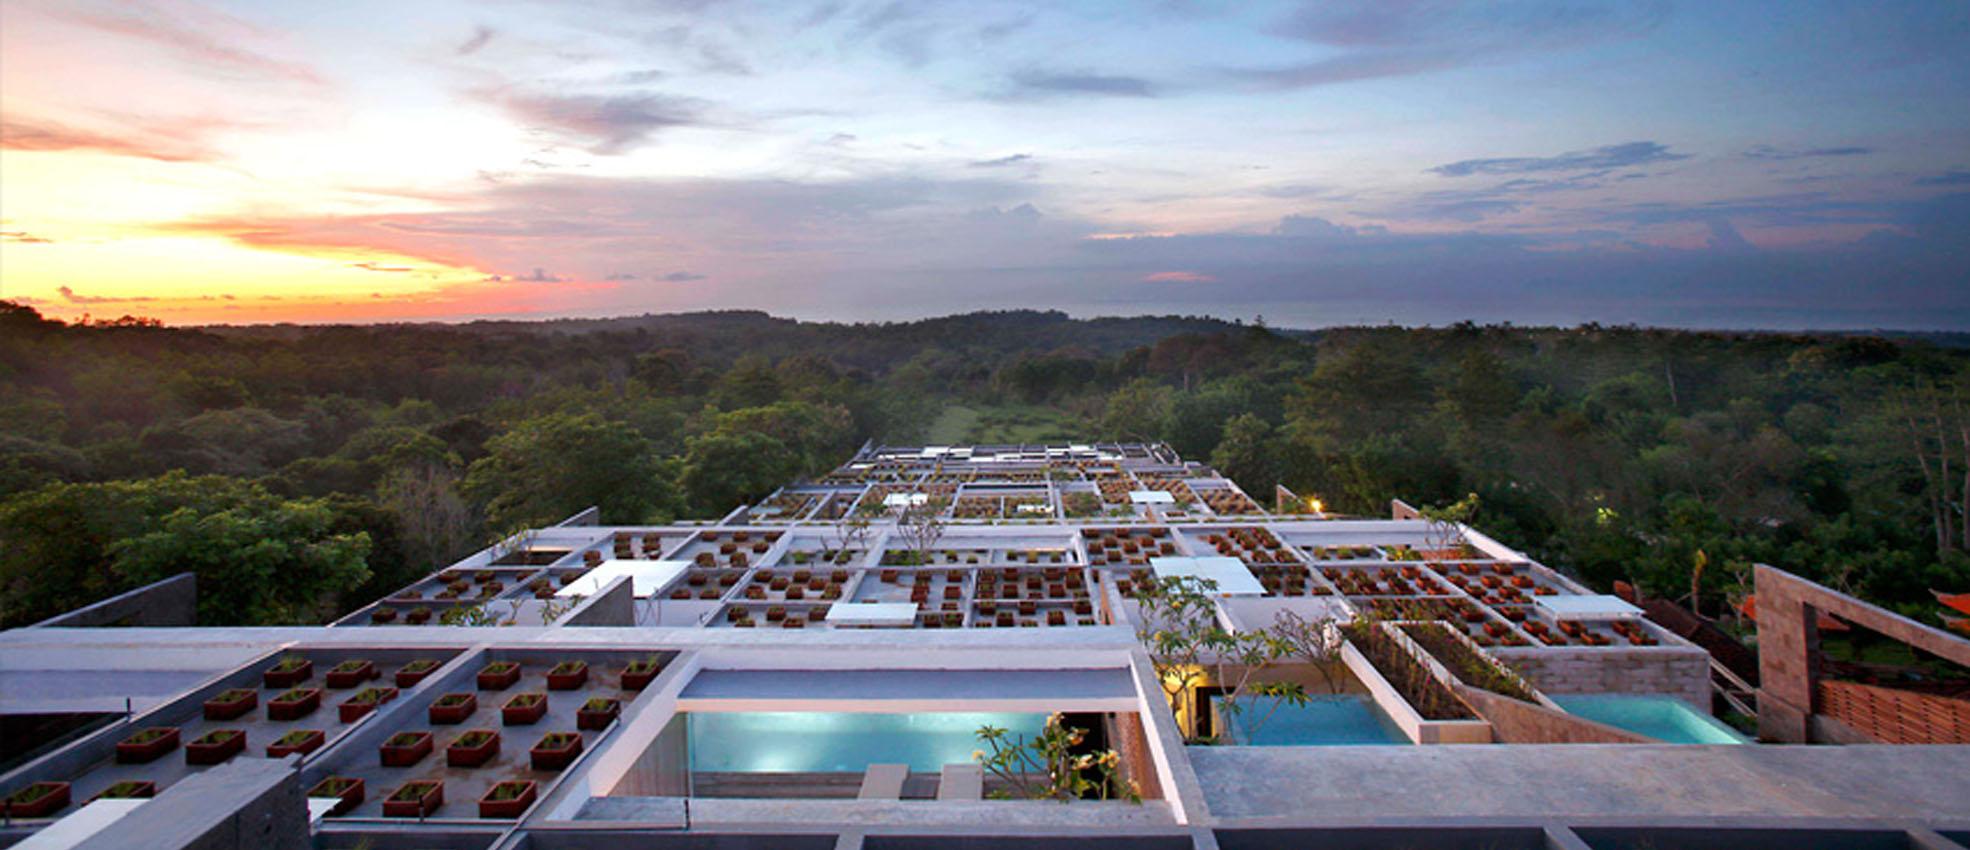 Hideaway Villas | Uluwatu, Bali